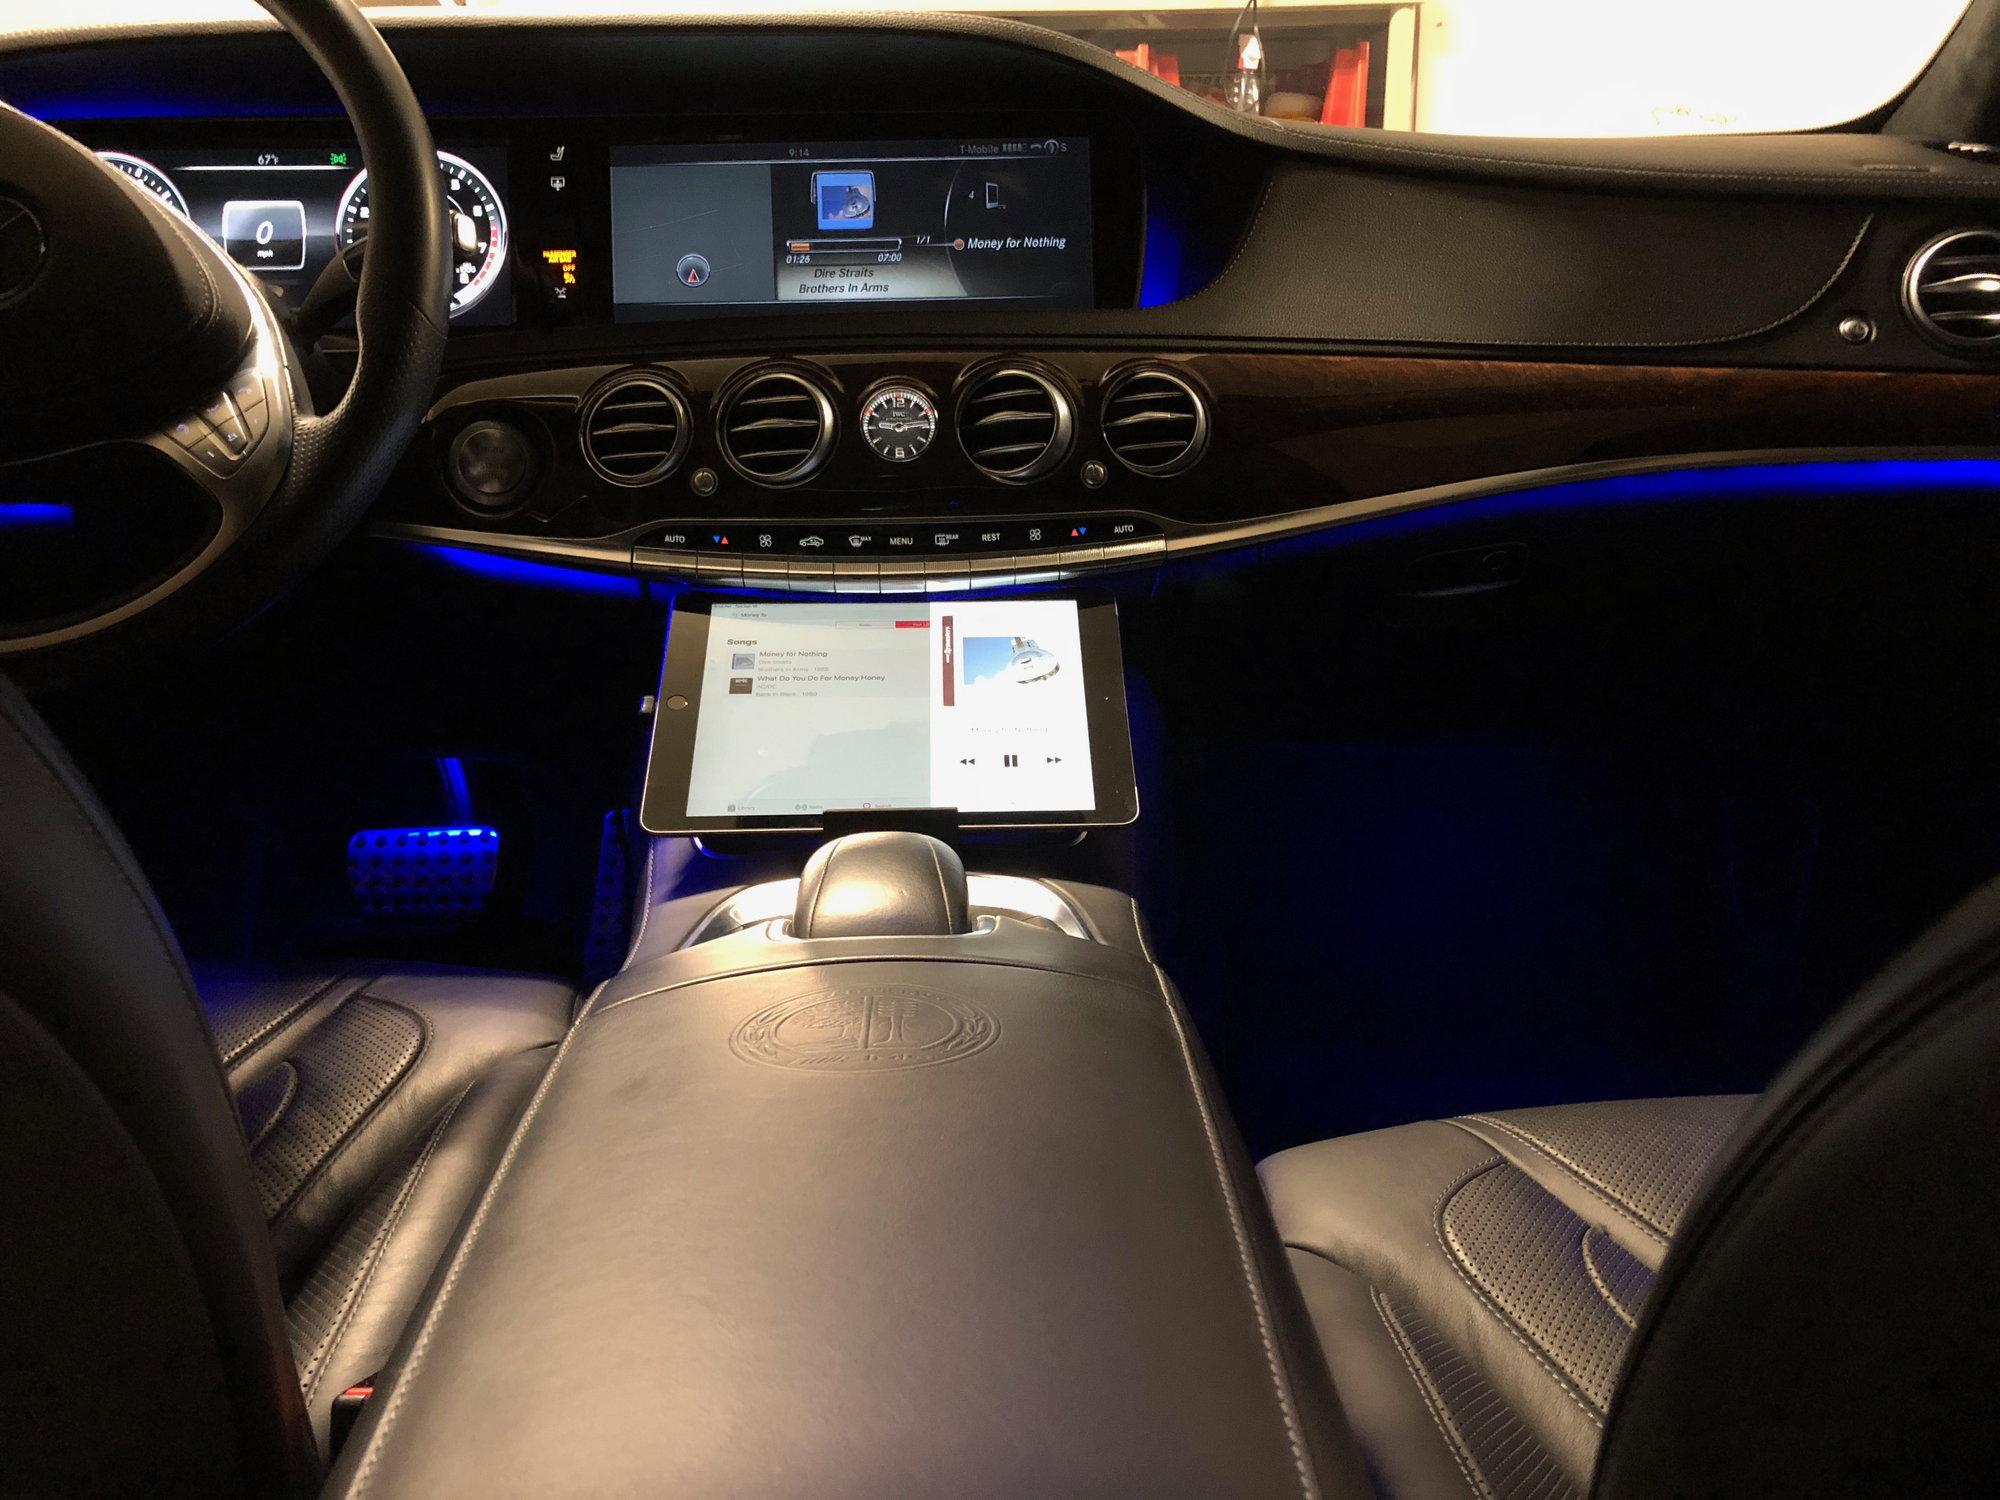 Waze Carplay Speedometer Incorrect